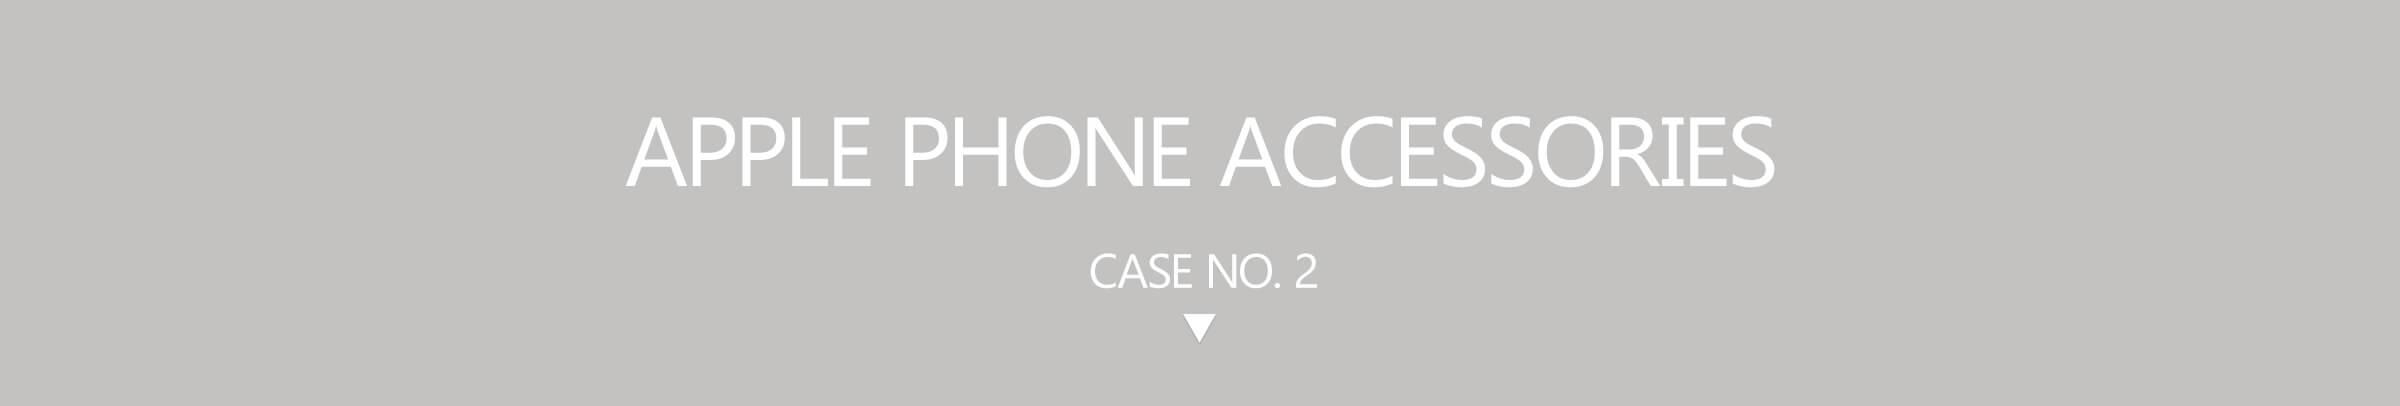 Apple mobile phone accessories store case 2